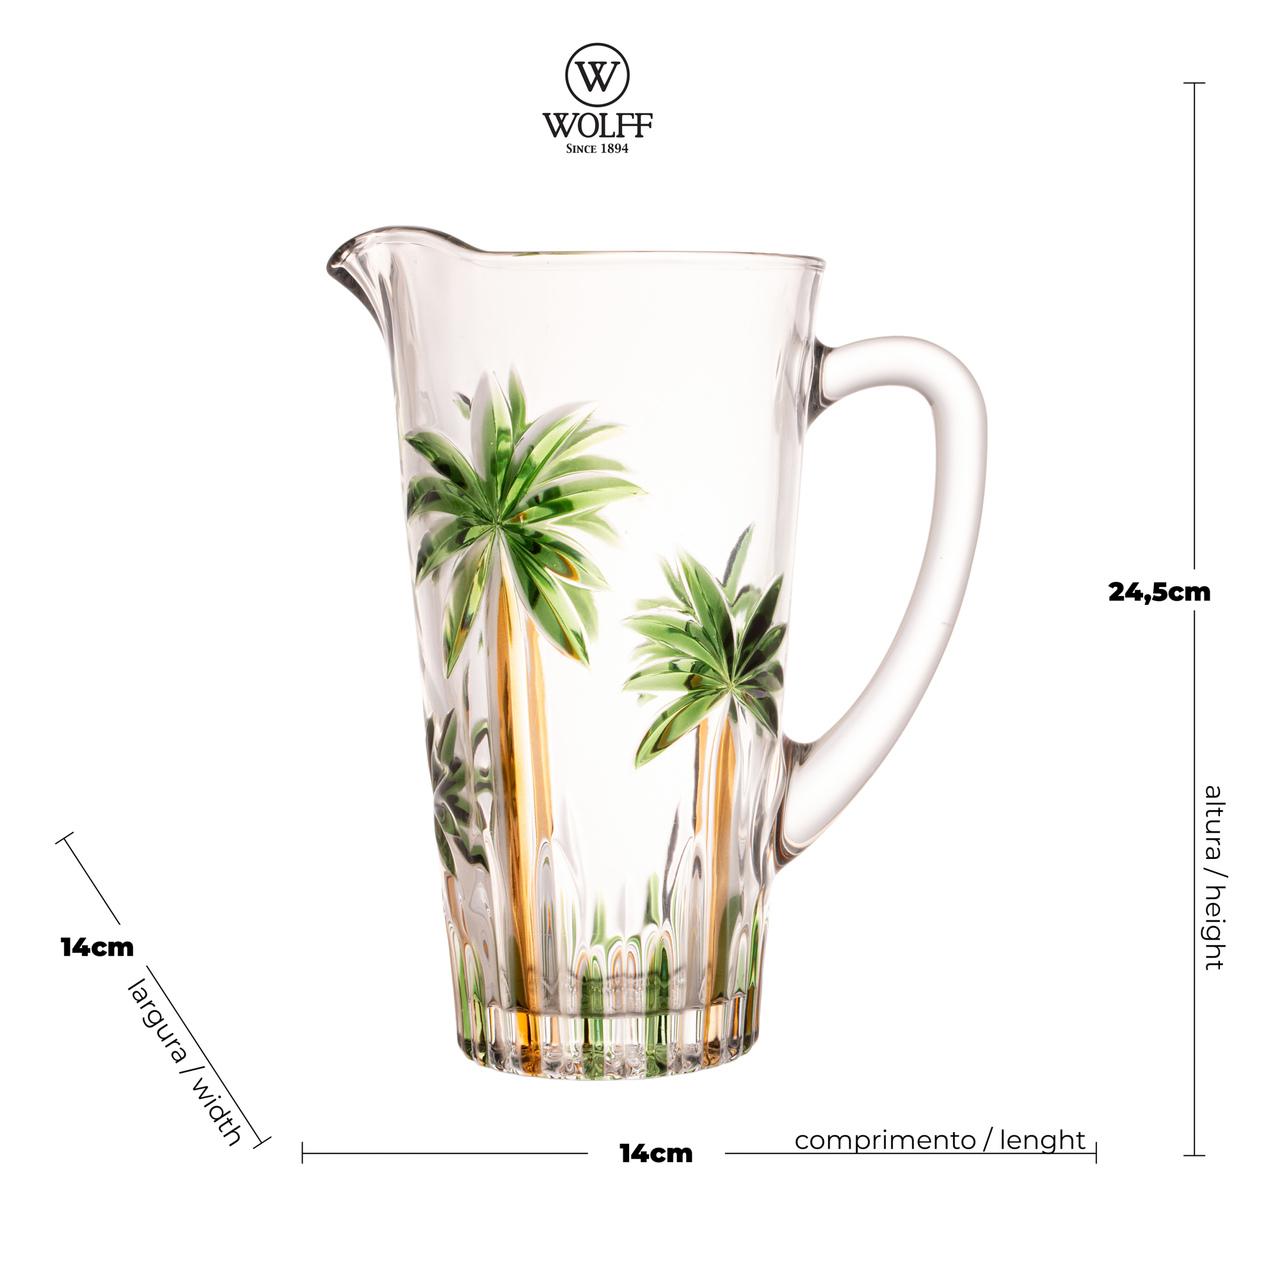 Jarra 1,2 L de cristal de chumbo Palm Tree Handpaint Wolff - 28150